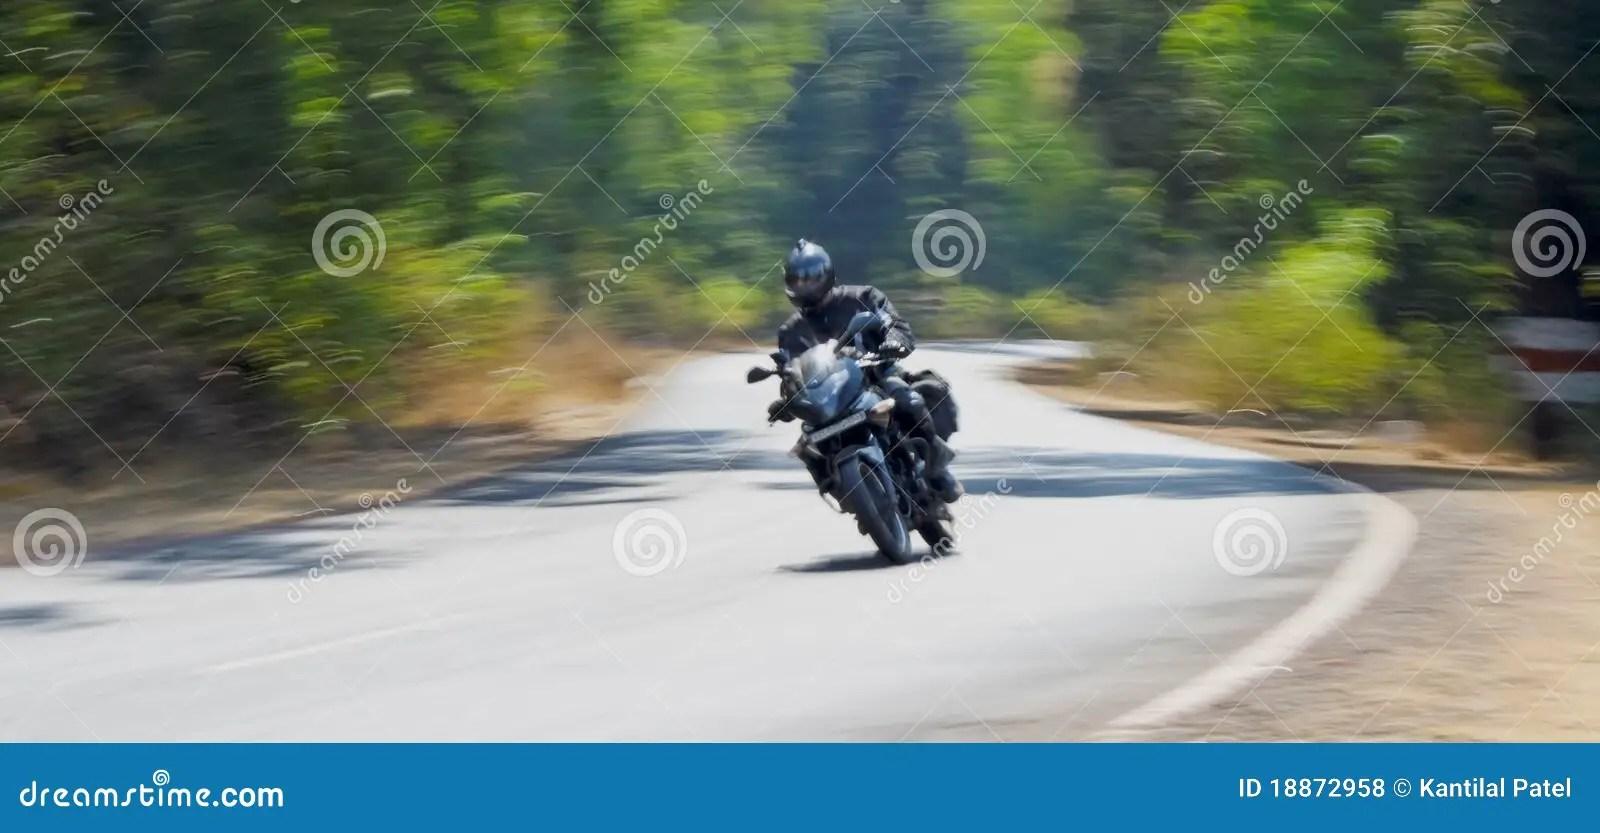 Motorbiker Speeds On Mumbai Goa Road Royalty Free Stock